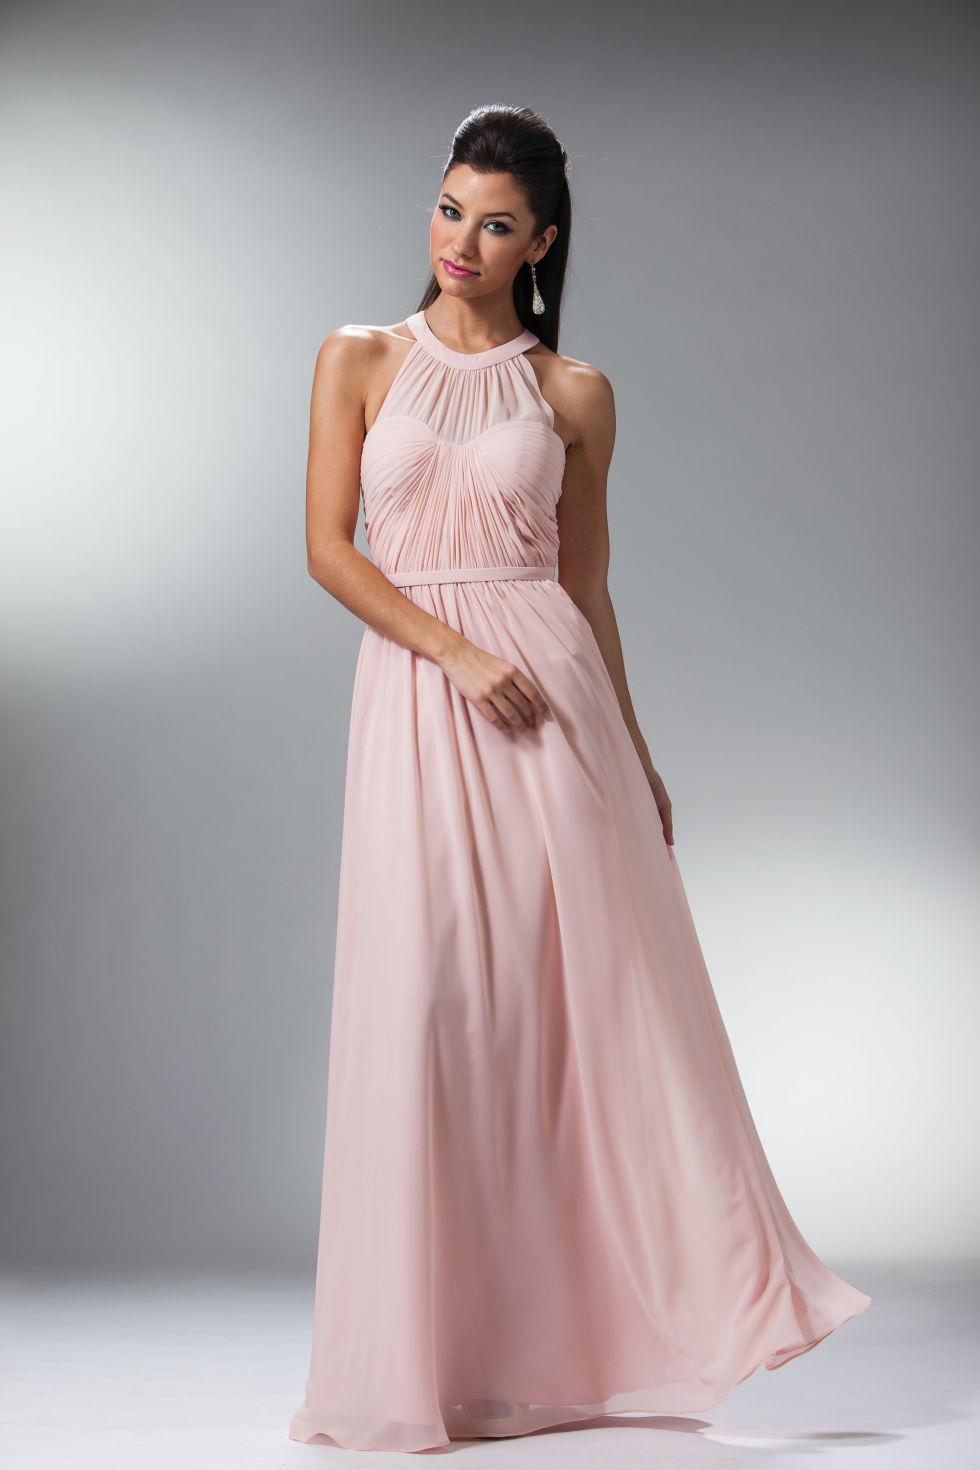 Prom Dresses Vintage Style - Ocodea.com